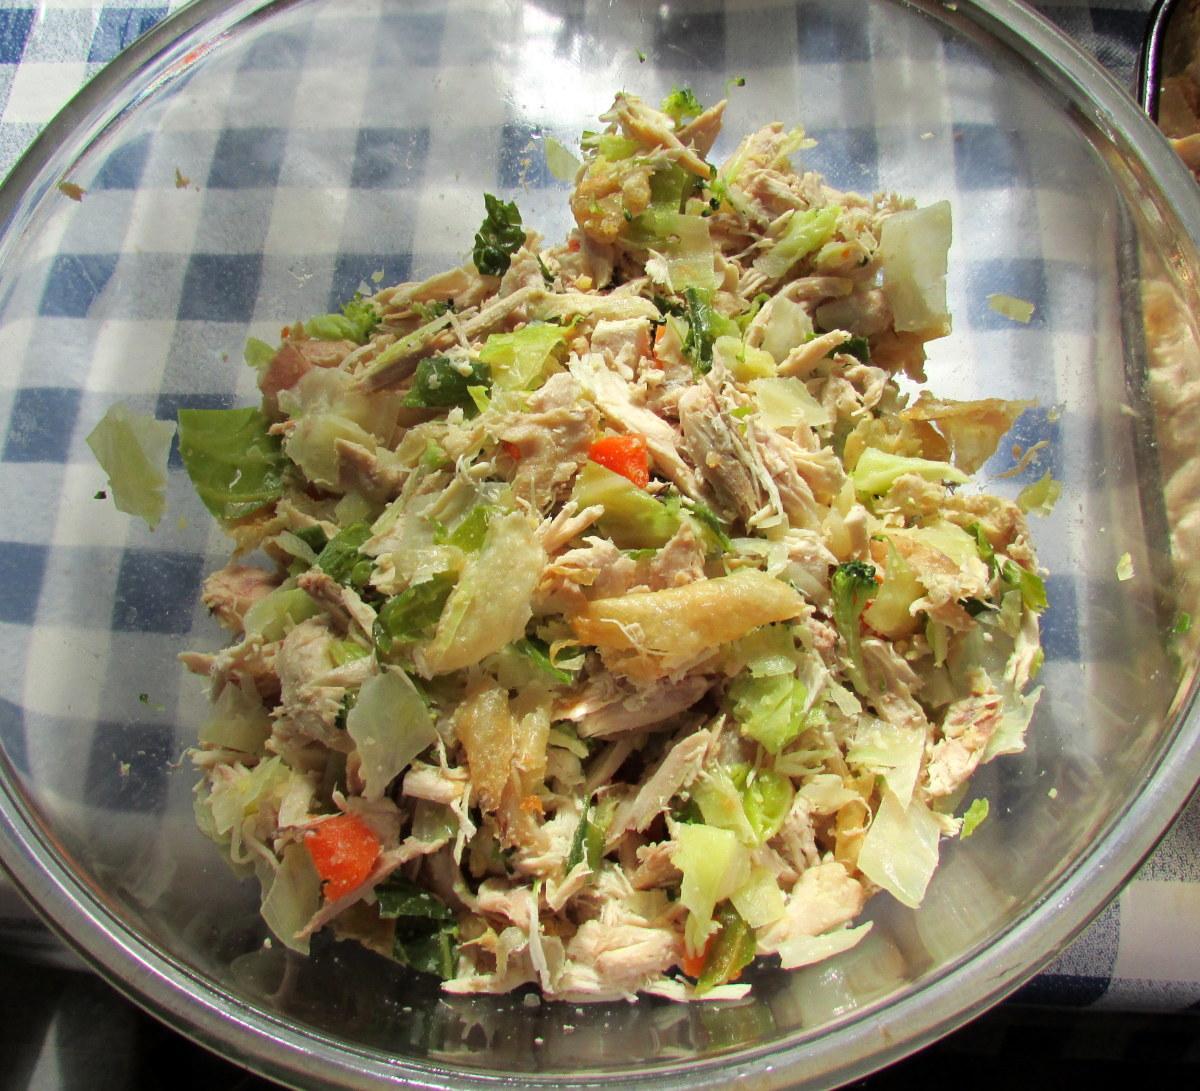 how to make homemade all natural dog food